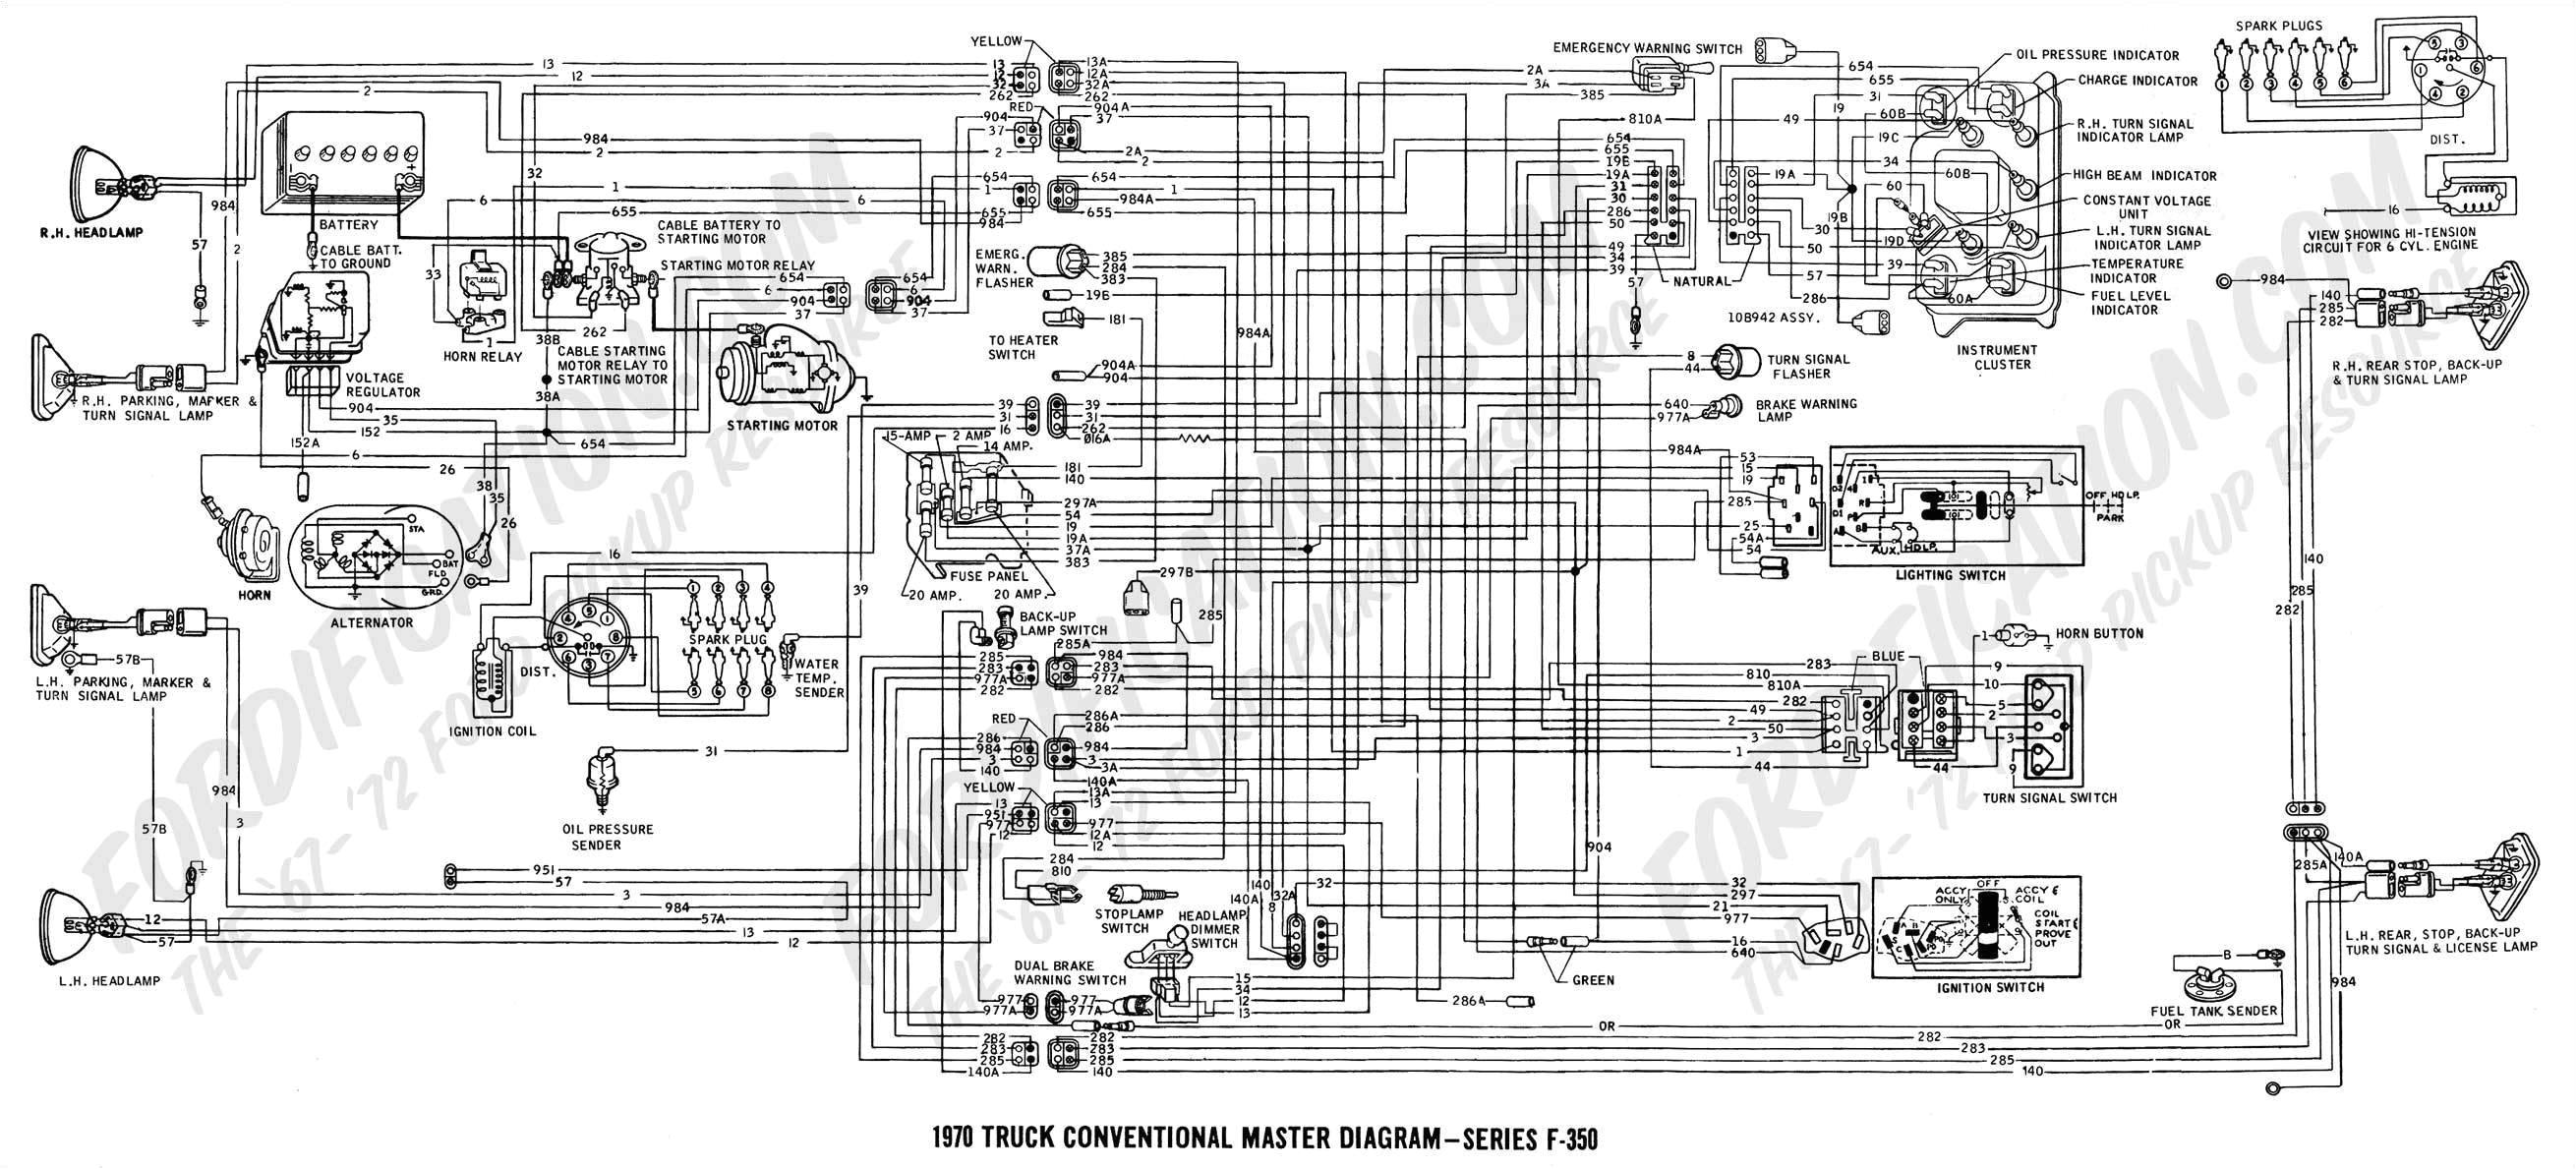 grasshopper 618 wiring diagram new pto install diagram schematics wiring diagrams